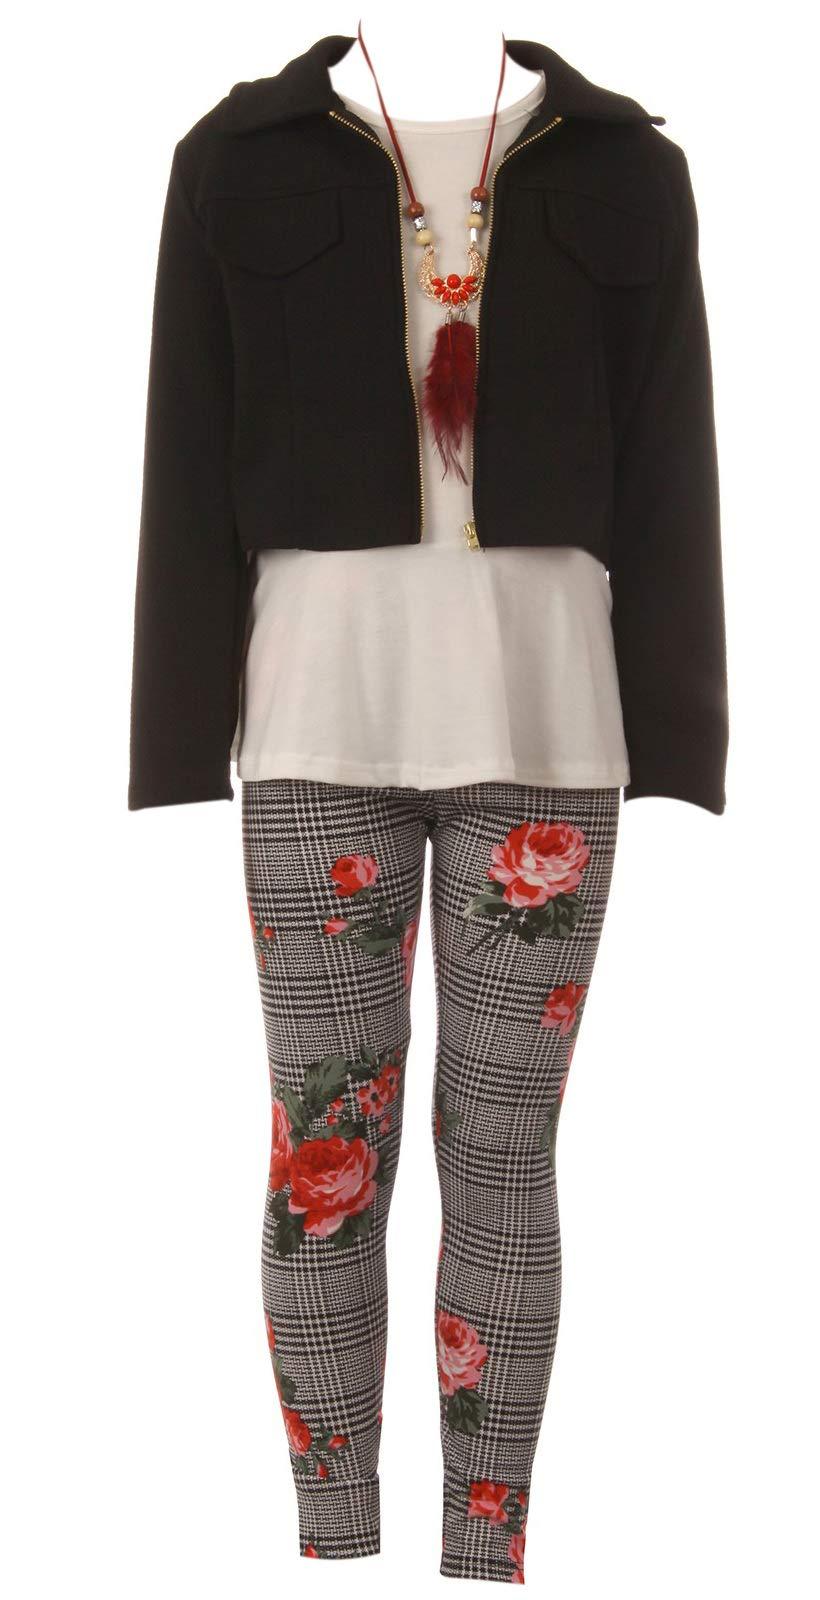 Big Girls 4 Pieces Girl Pant Set Long Sleeve Jacket Necklace Floral Plaid Pant Tank Top White Coral 12 (J21KS41)